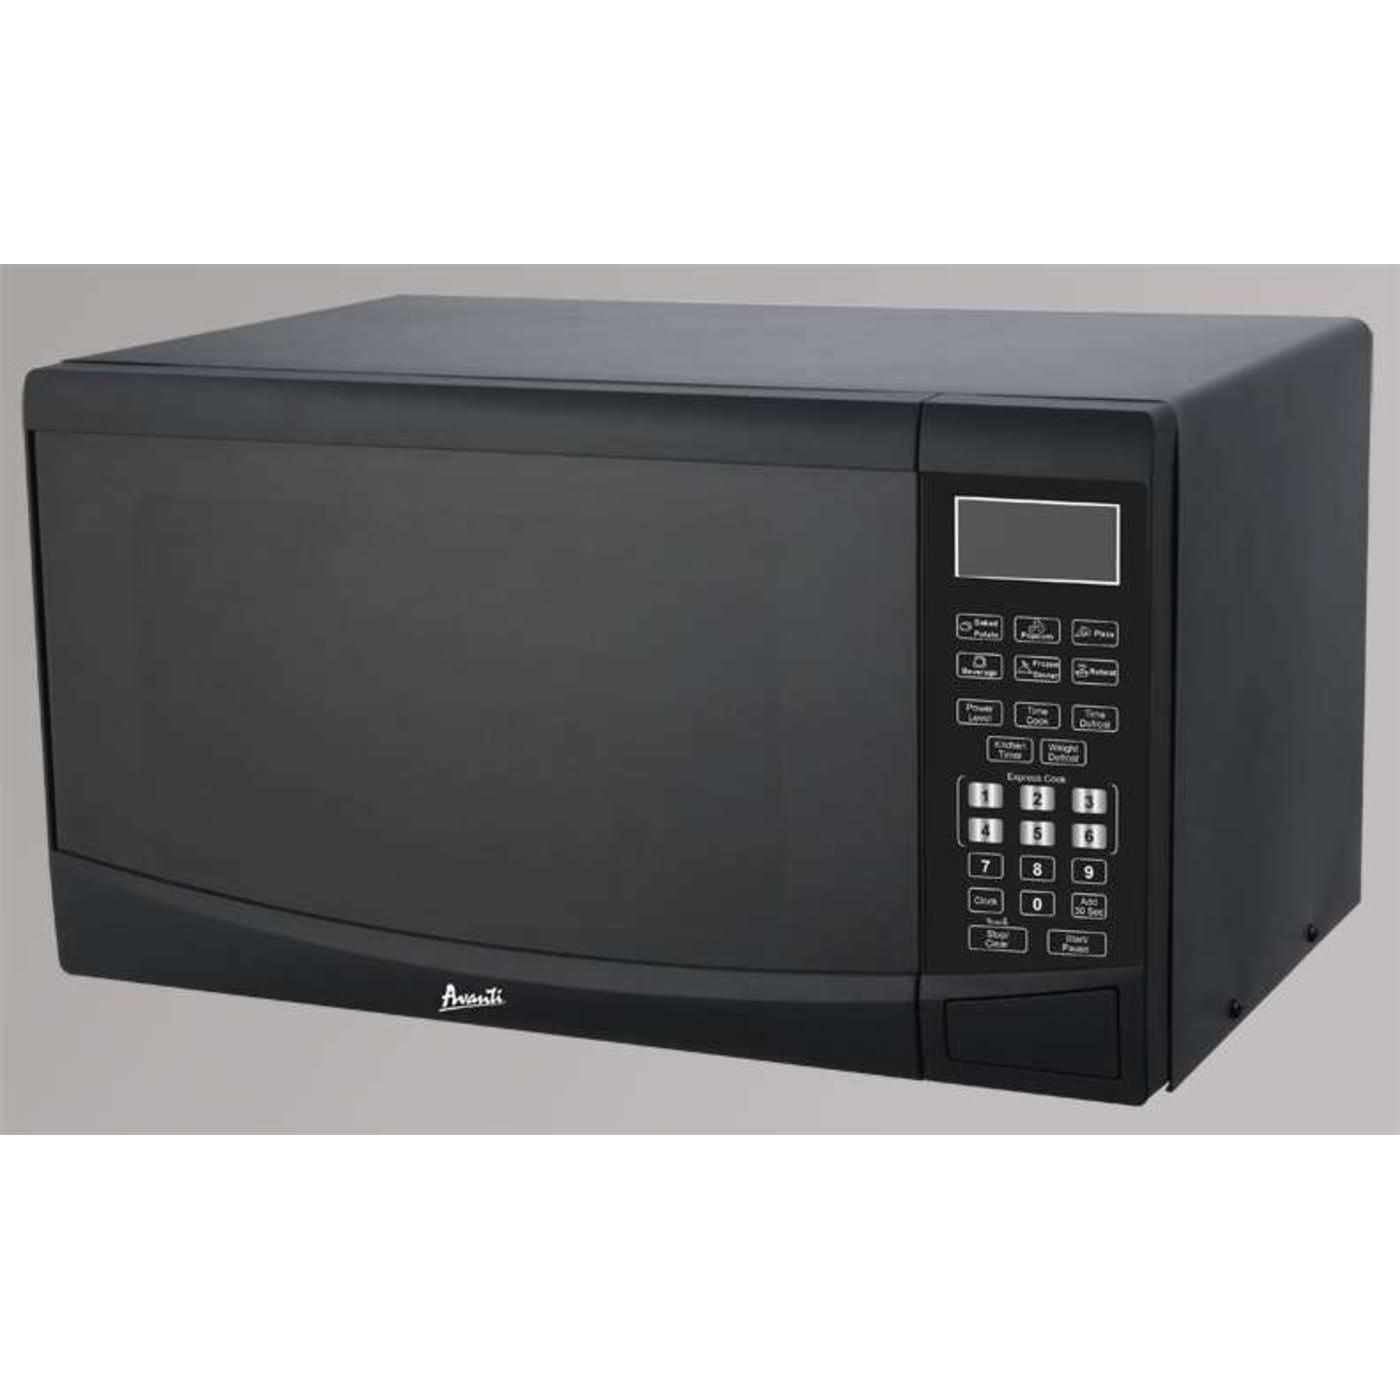 Avanti 0.9 CF Touch Microwave - Black